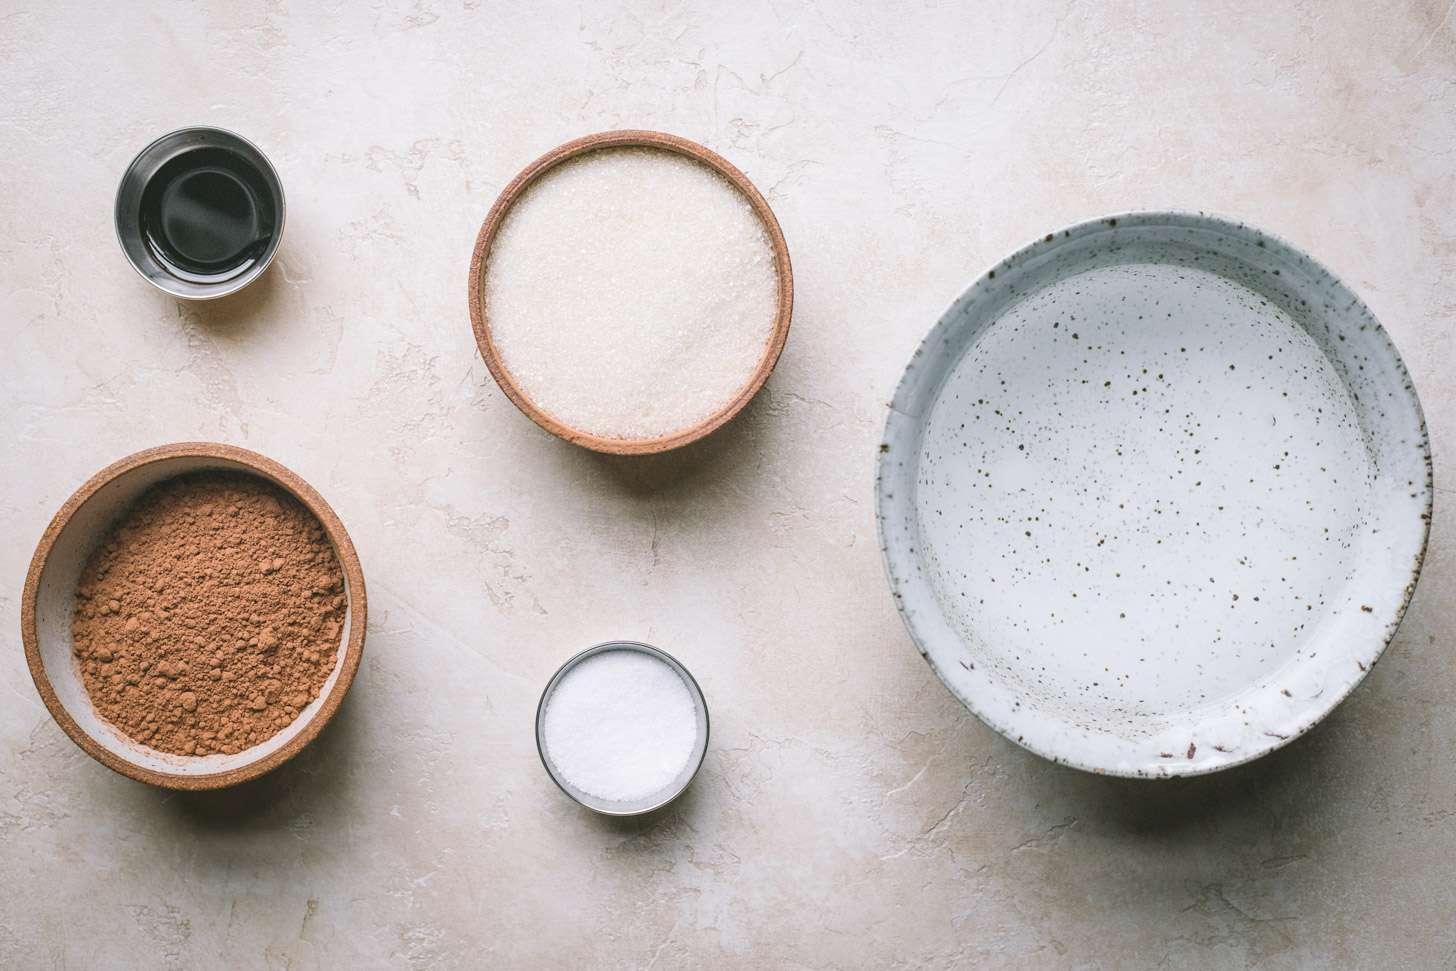 Ingredients for vegan chocolate sorbet